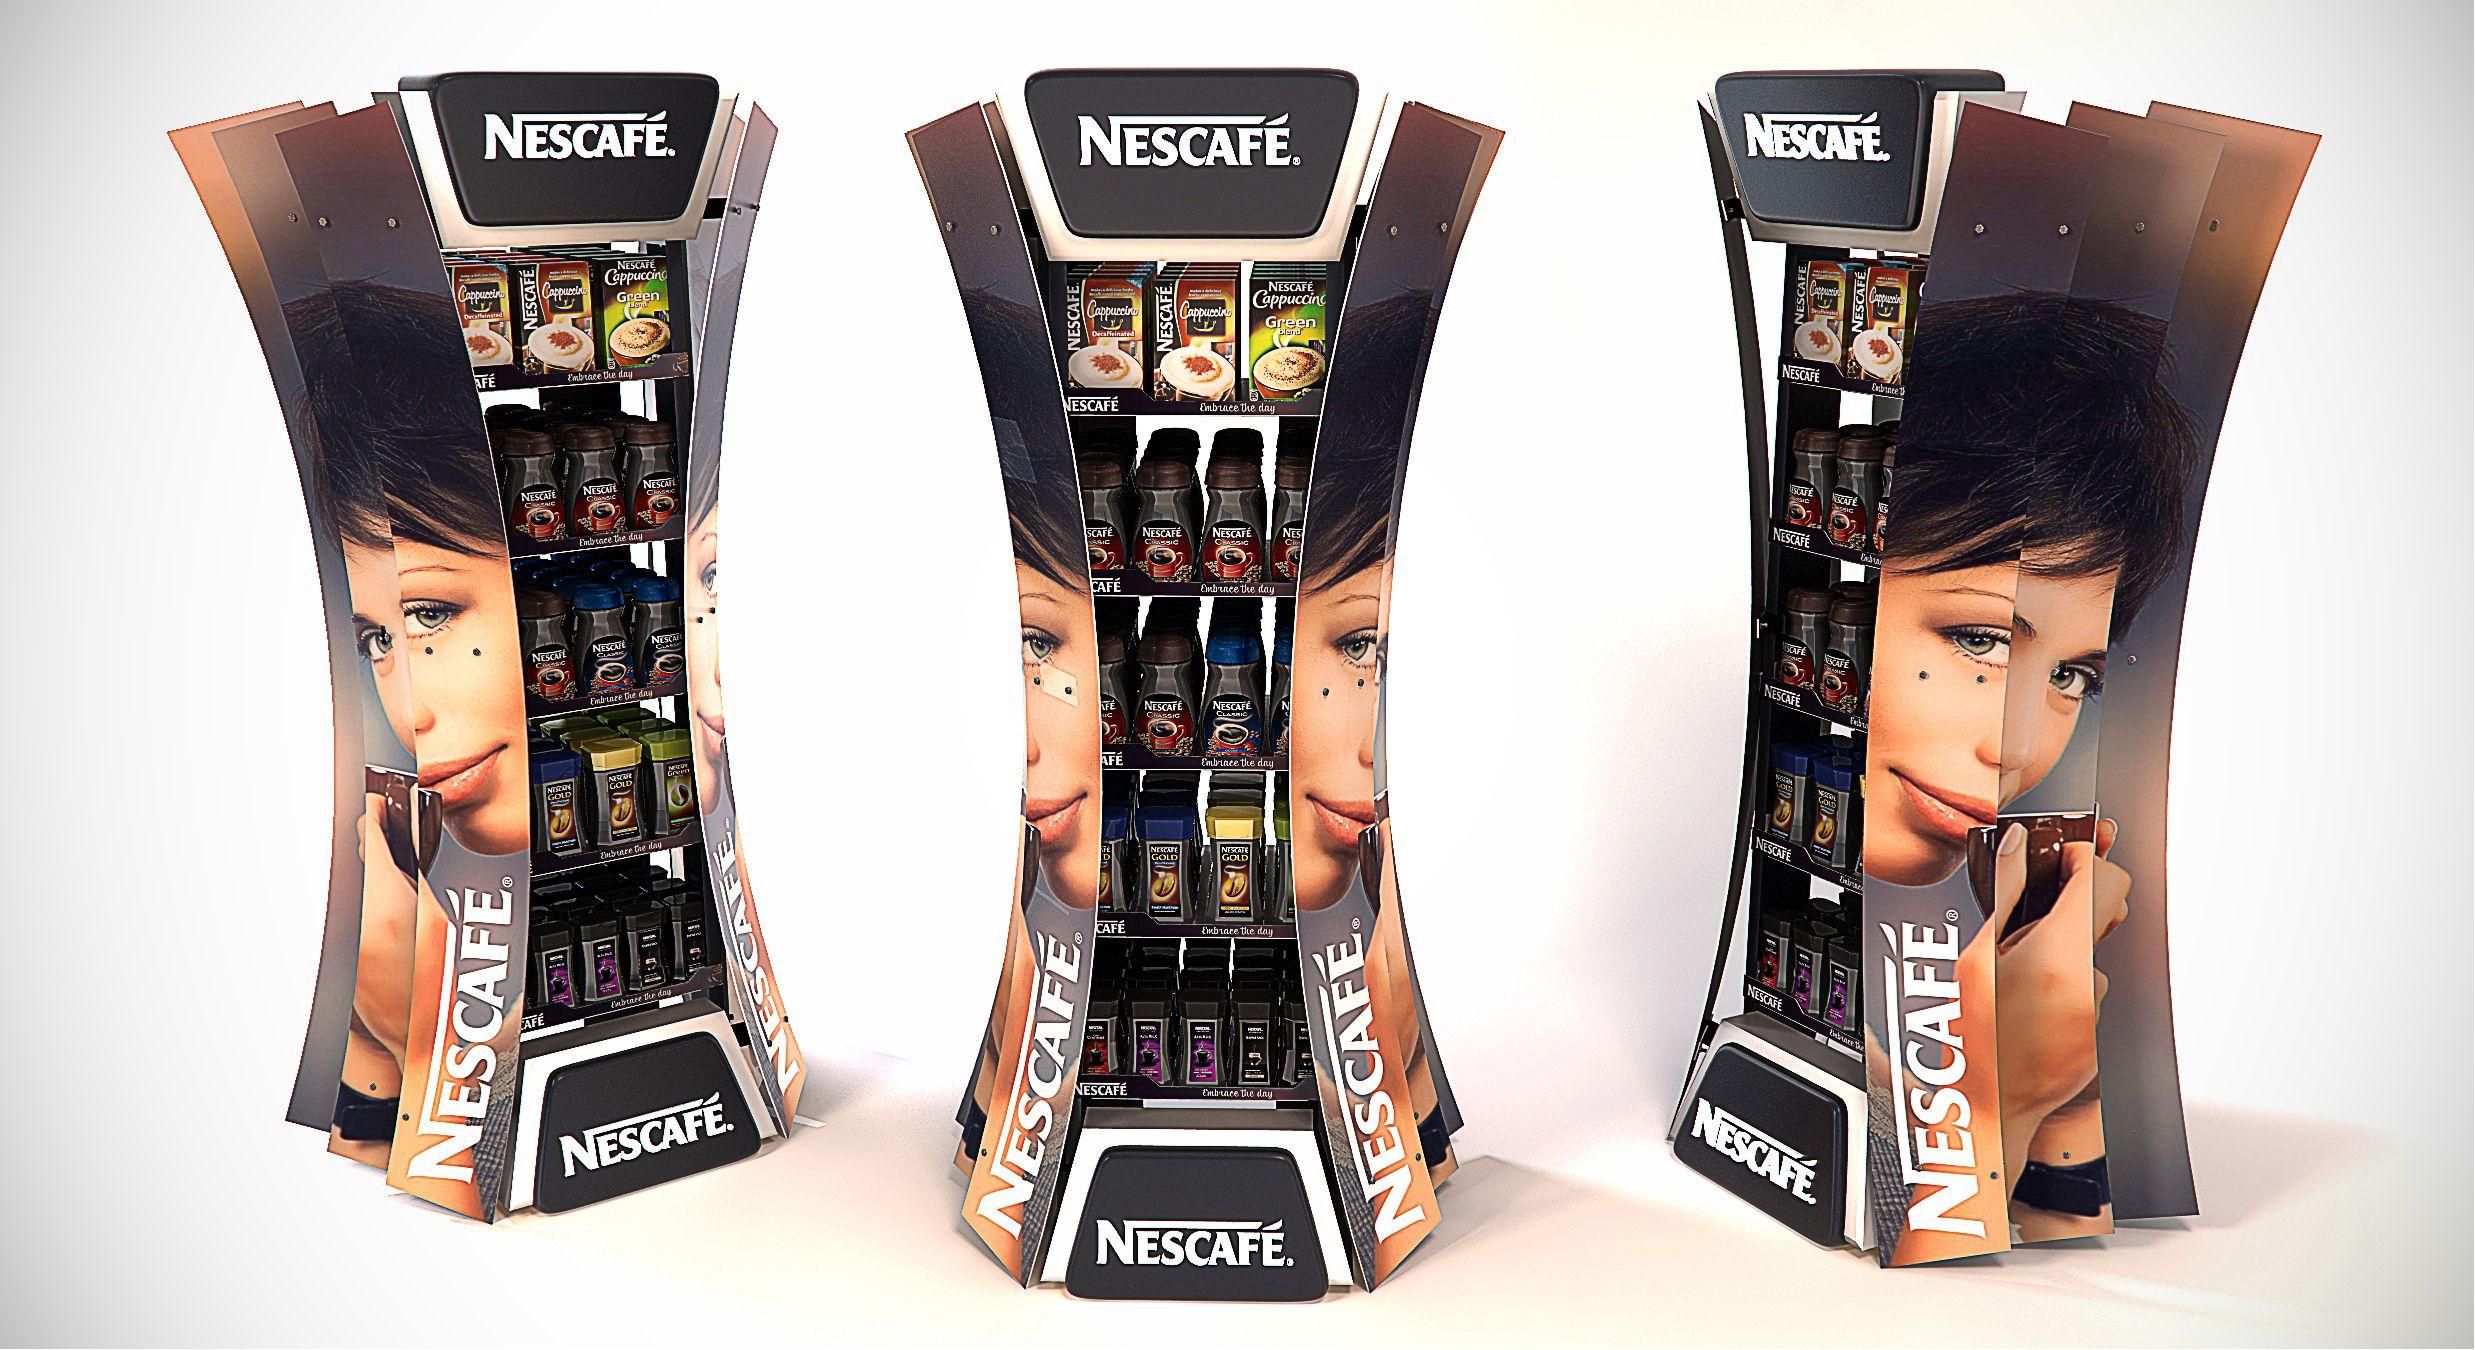 Nescafe Slat FSU, Concept, POS, POP, FSU. Designed by Lance Eggersglusz. Point of sale.